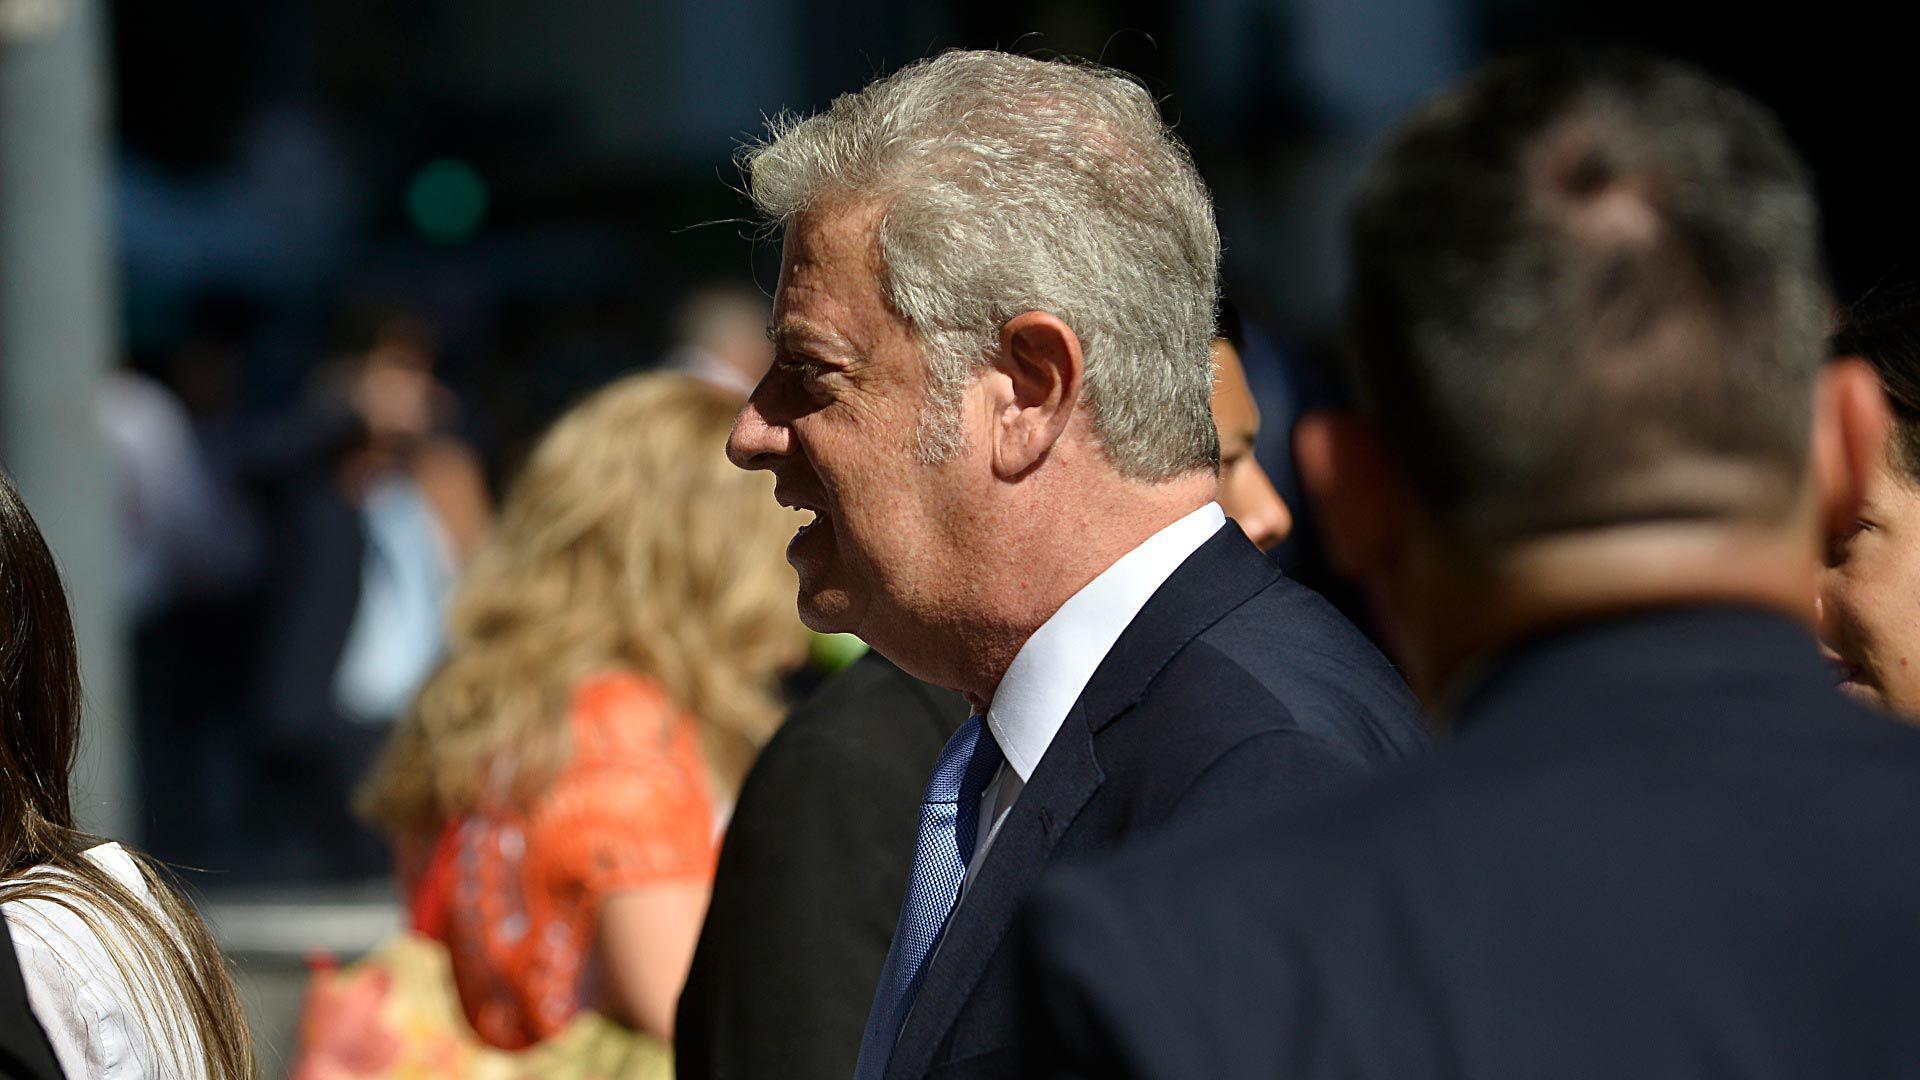 Carlos Beraldi, el abogado defensor de Cristina Kirchner